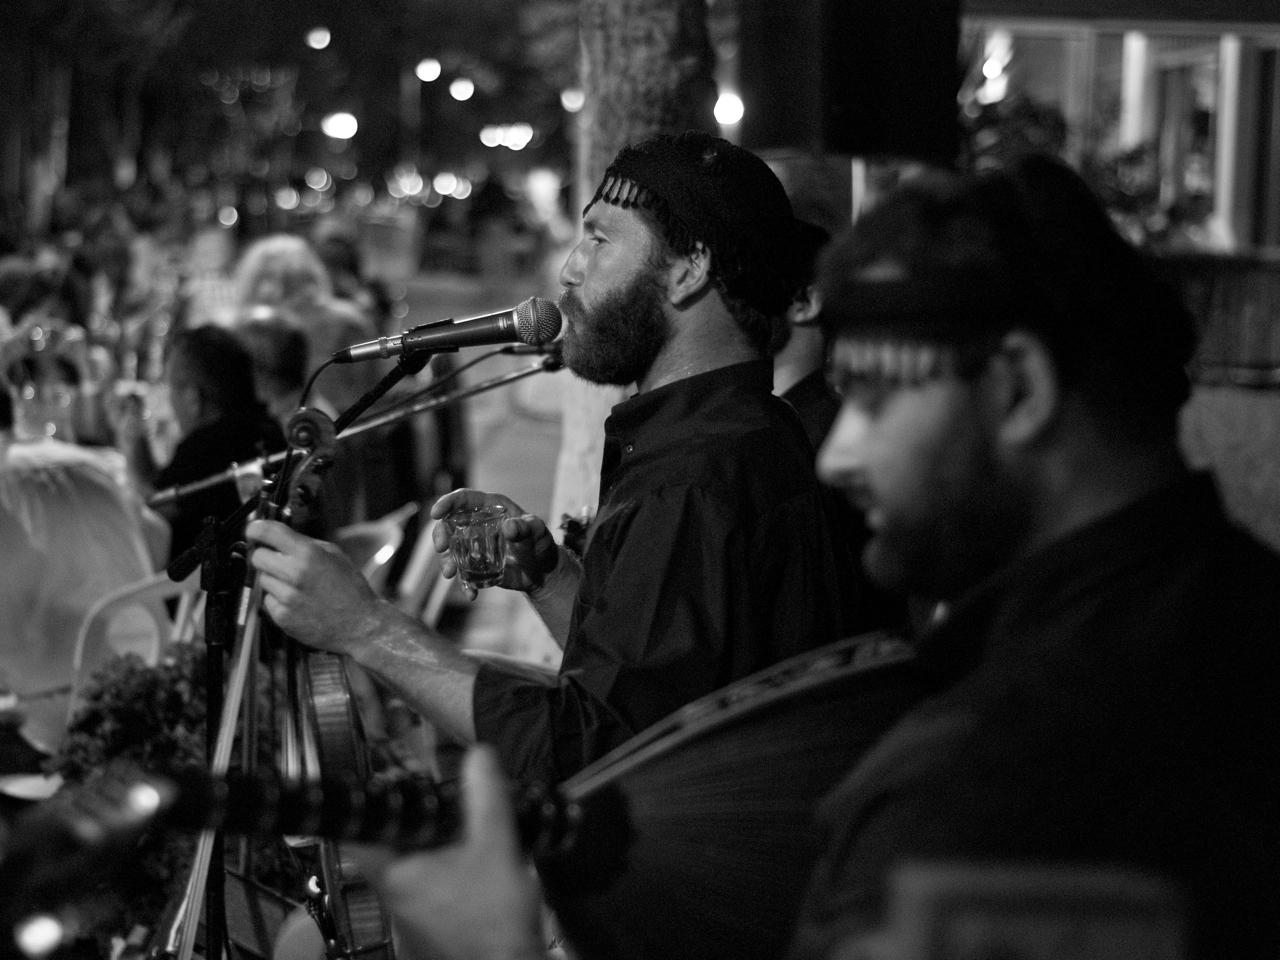 Crete & Cretan Music and Musicians